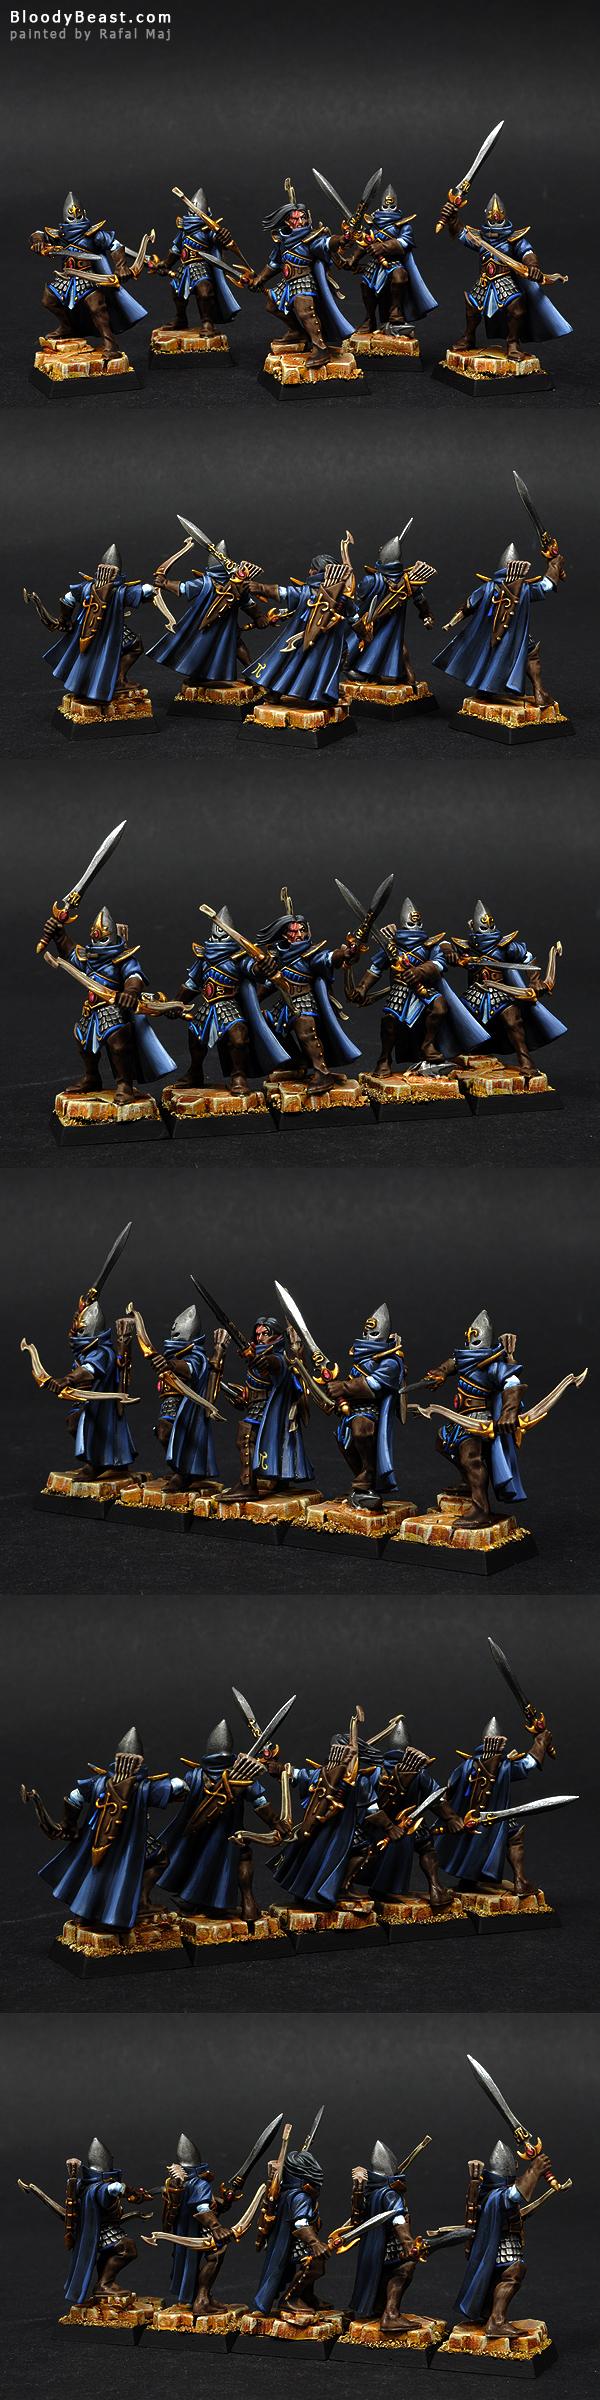 High Elves Shadow Warriors painted by Rafal Maj (BloodyBeast.com)